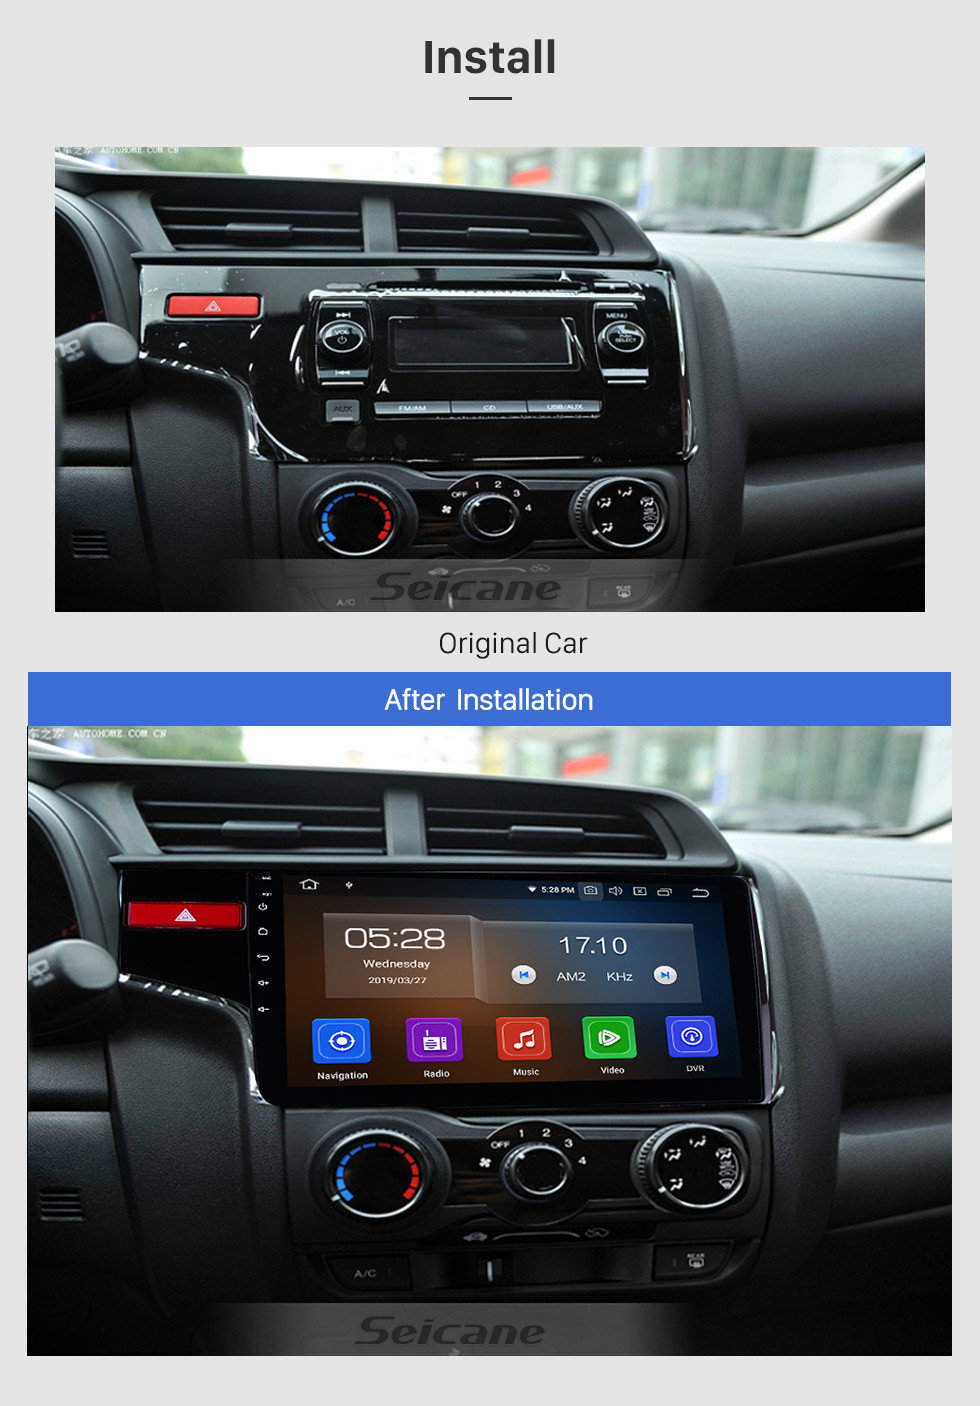 medium resolution of  seicane 10 1 inch 2014 2015 2016 honda fit 1024 600 touchscreen android 9 0 radio bluetooth